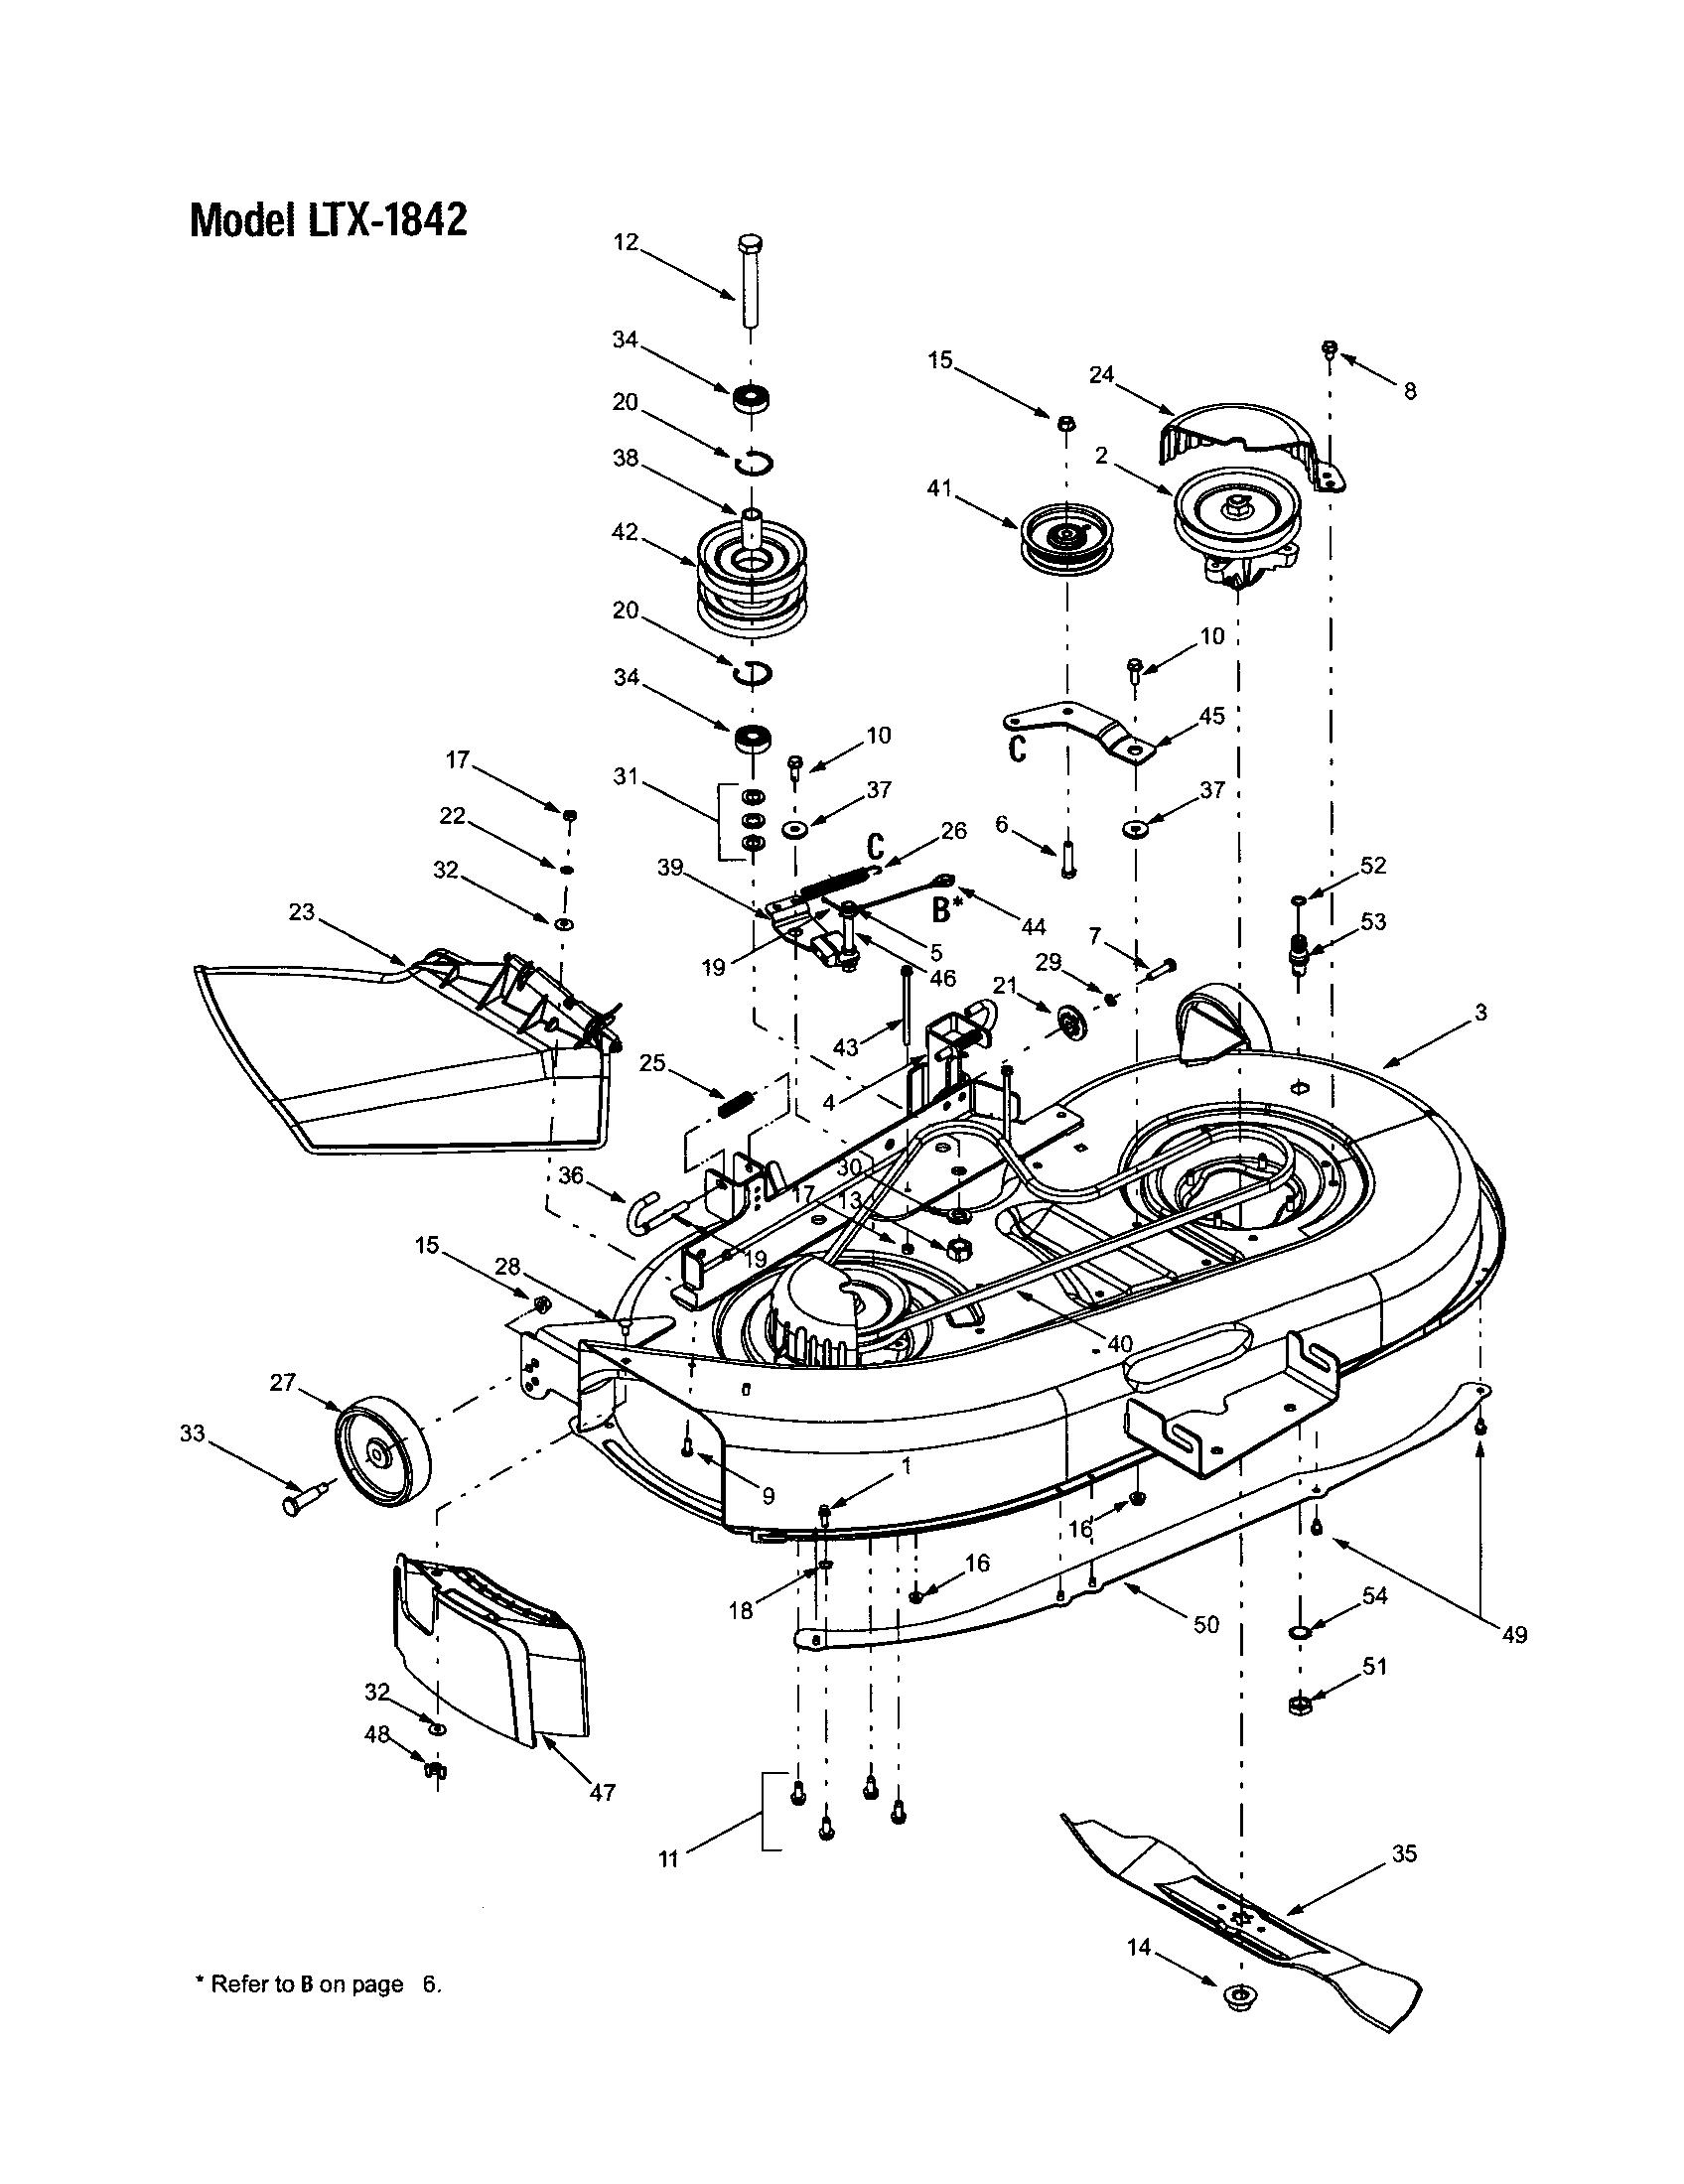 Troybilt lawn tractor parts model 13ap609g063 sears partsdirect rh searspartsdirect mtd solenoid wiring diagram mtd